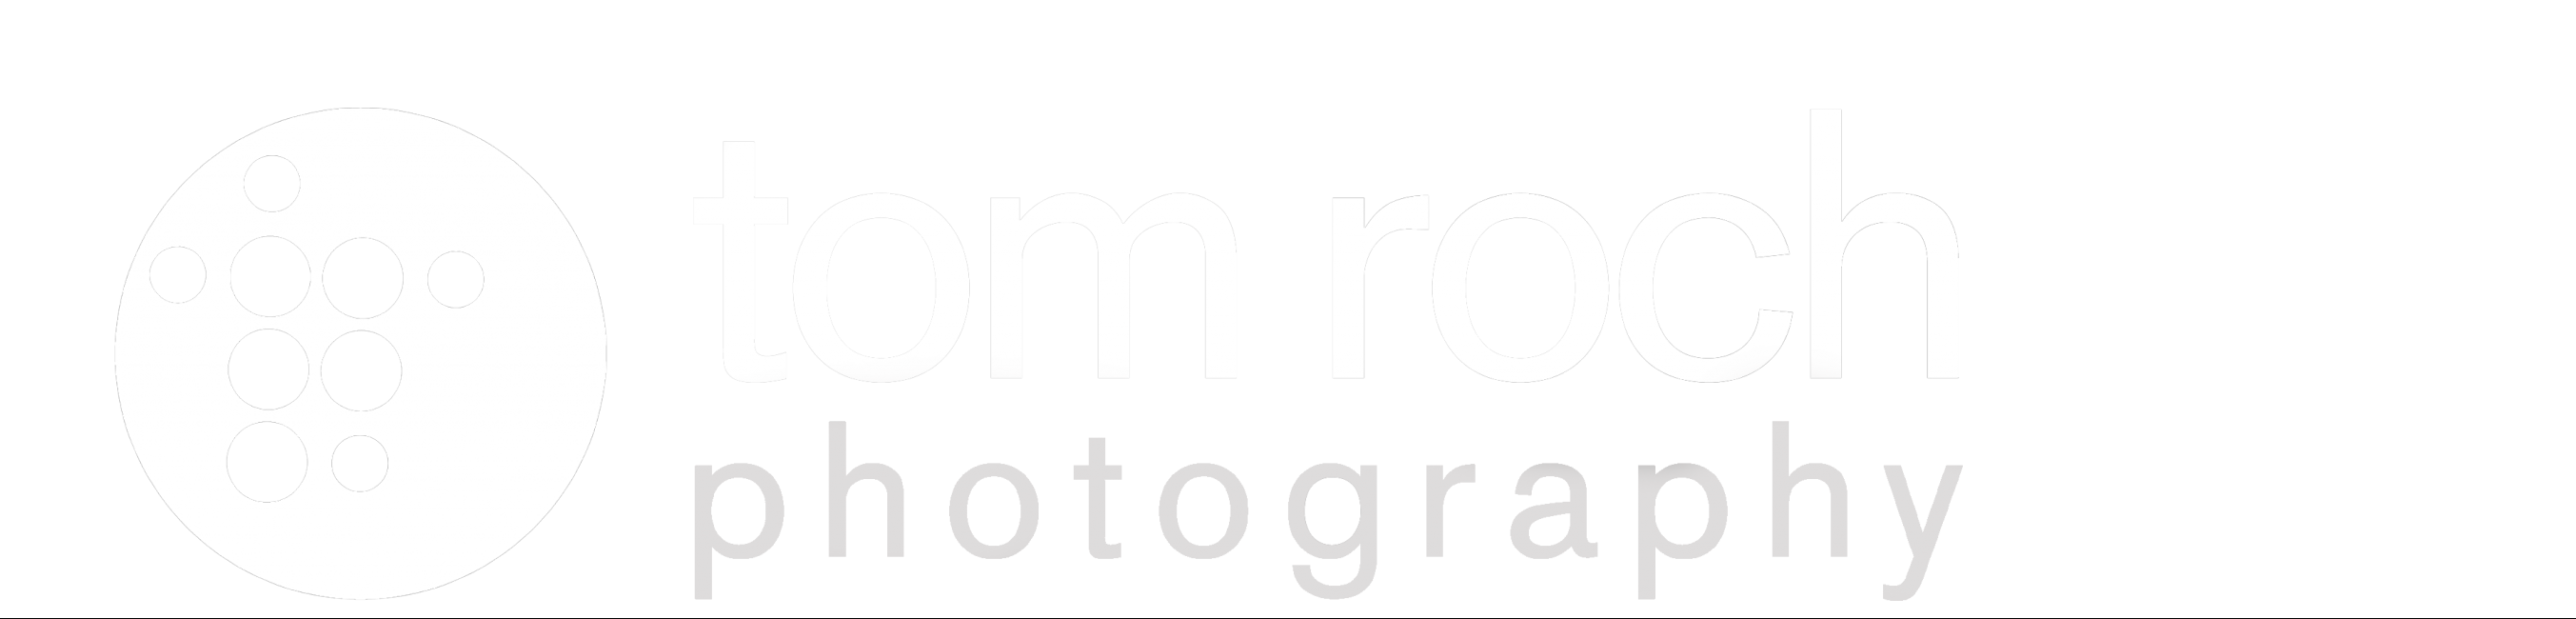 tom roch photography